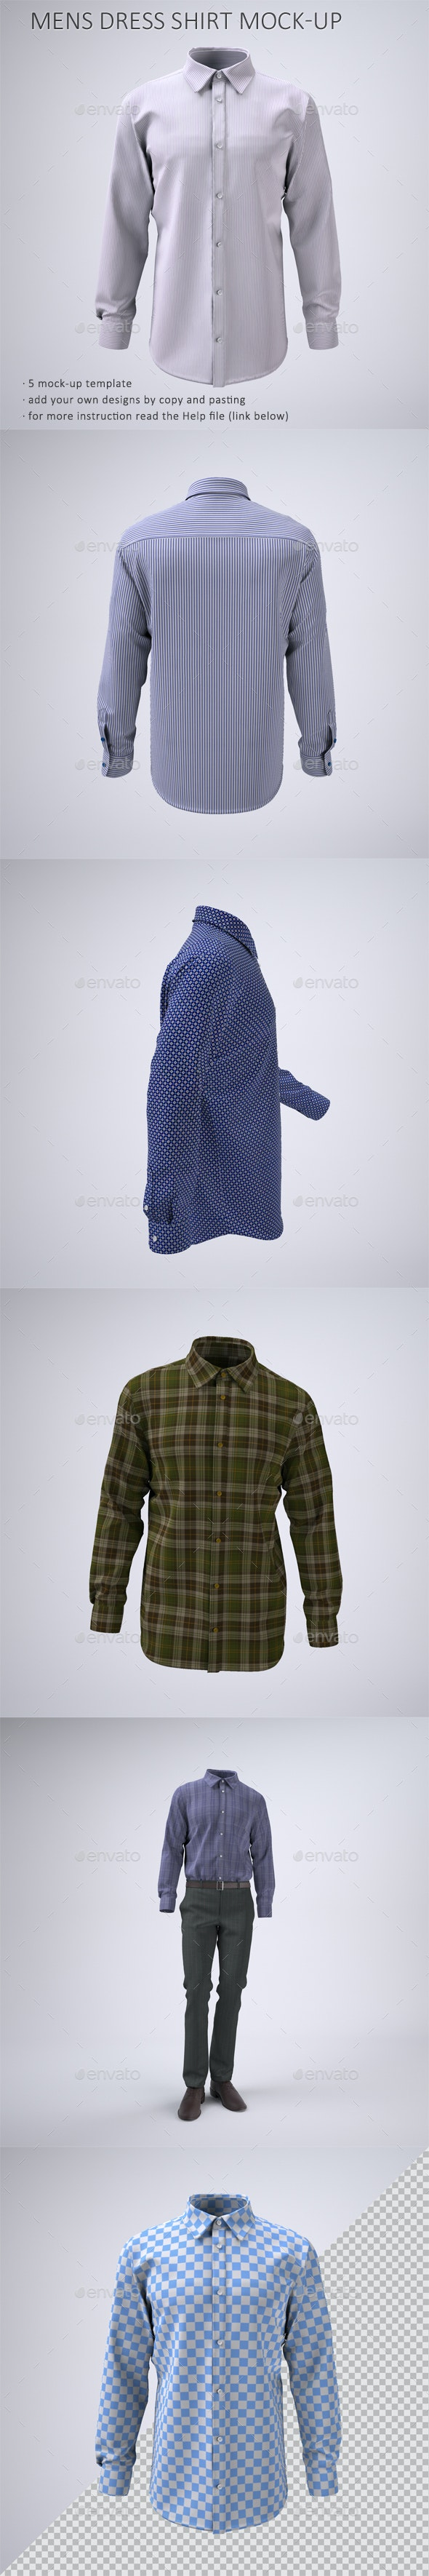 Men's Long Sleeve Dress Shirt Mock-Up - Apparel Product Mock-Ups